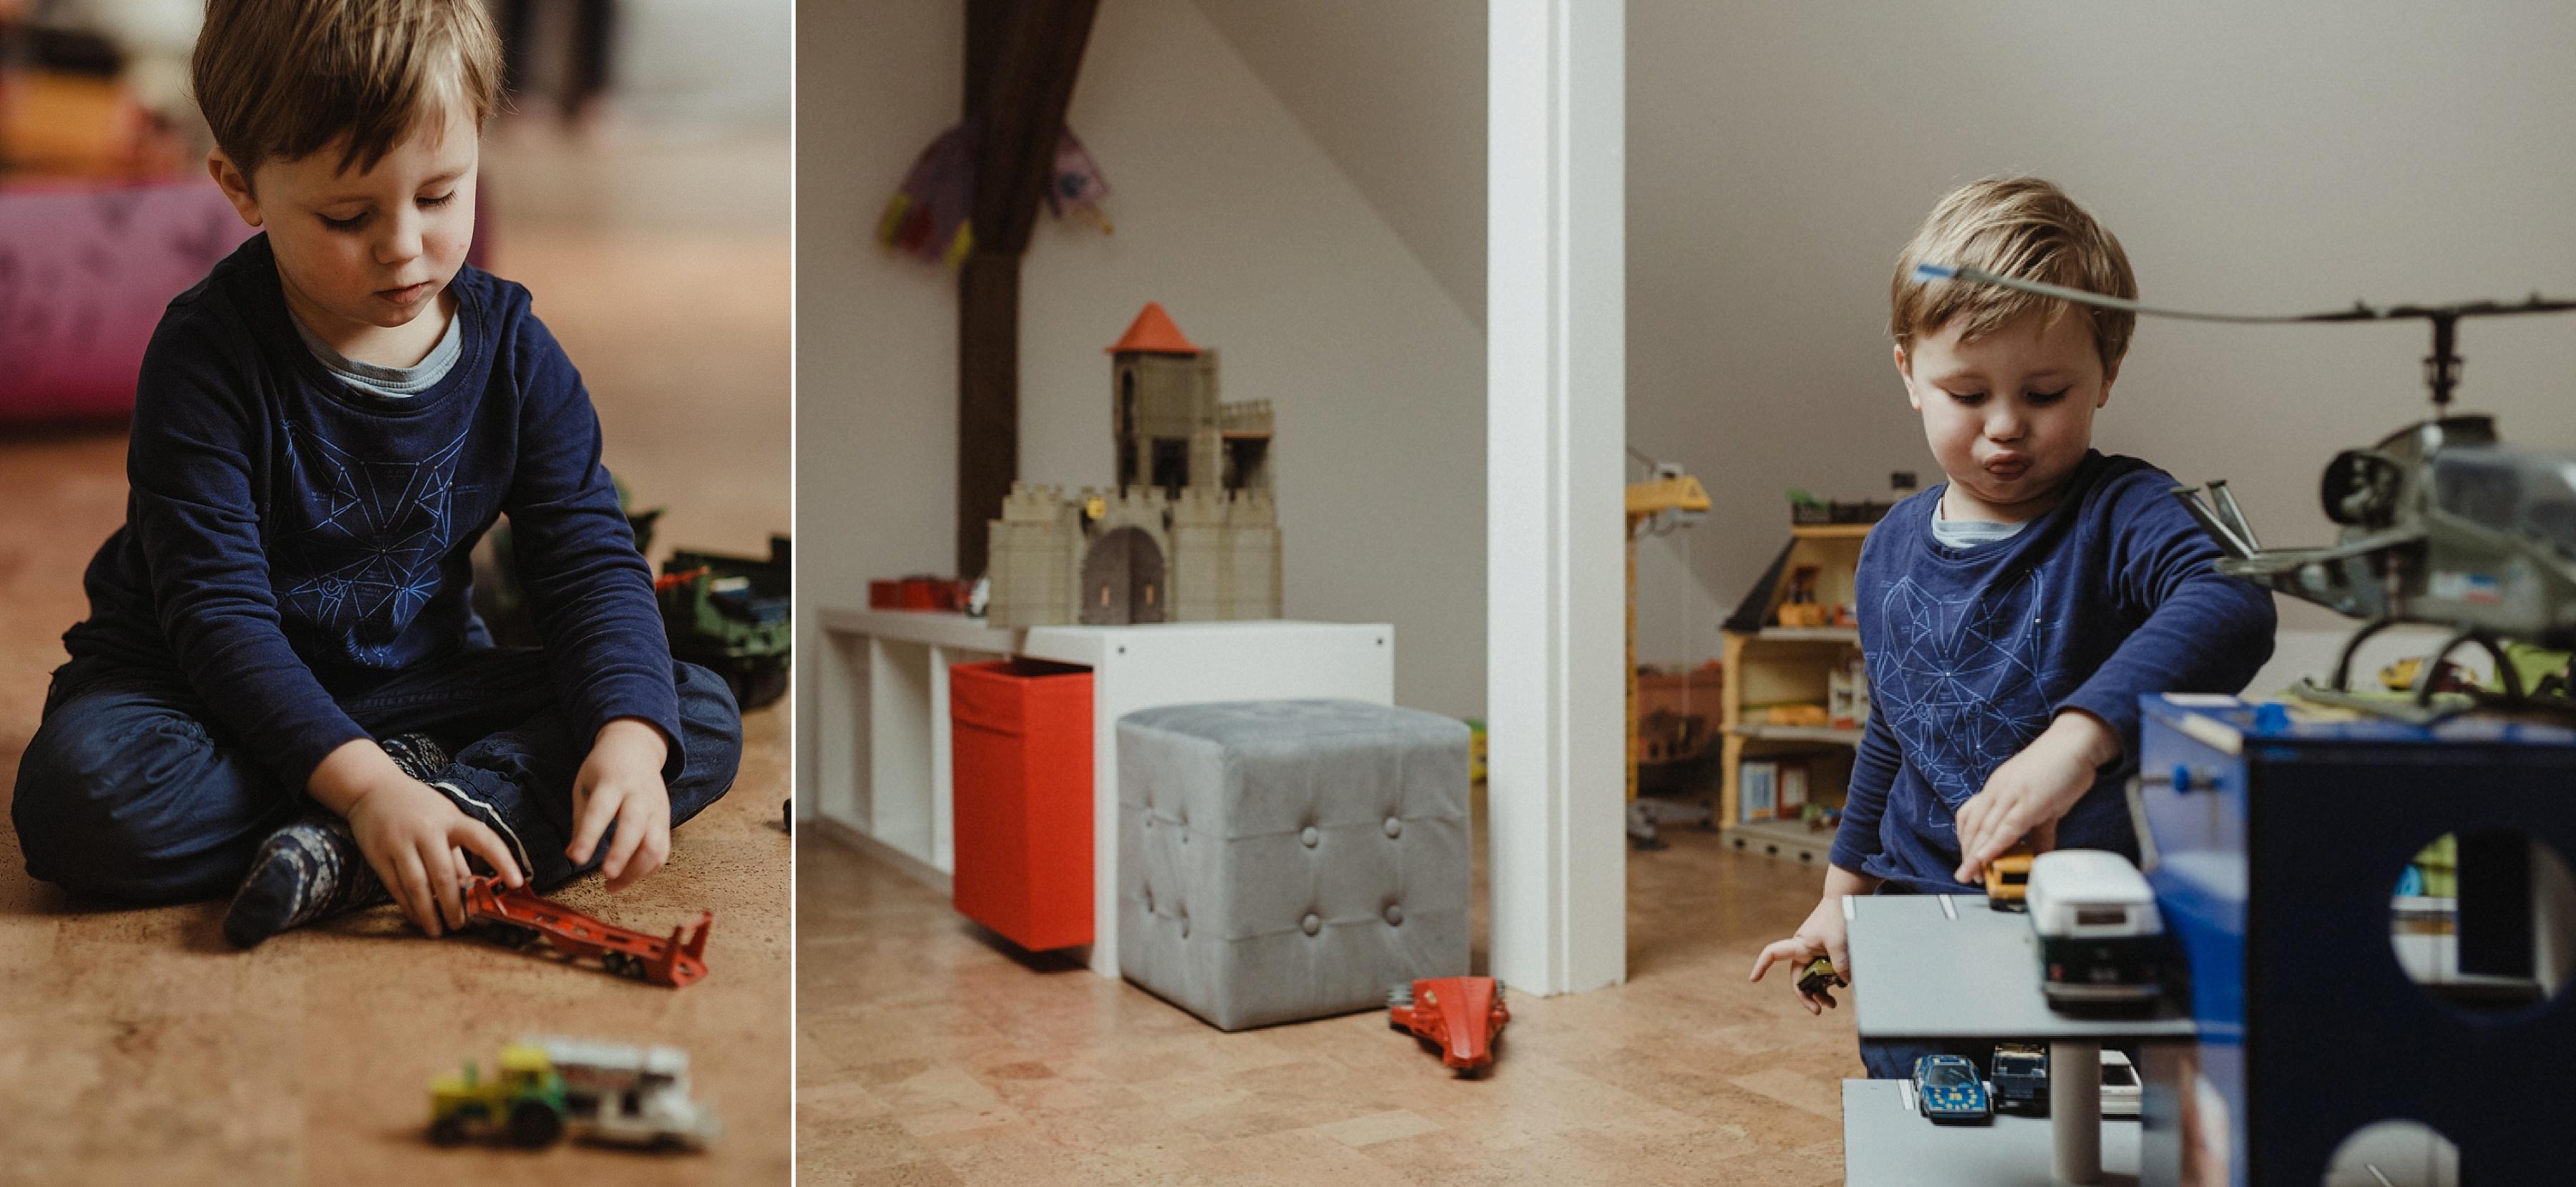 seance-photo-lifestyle-famille-mulhouse-alsace